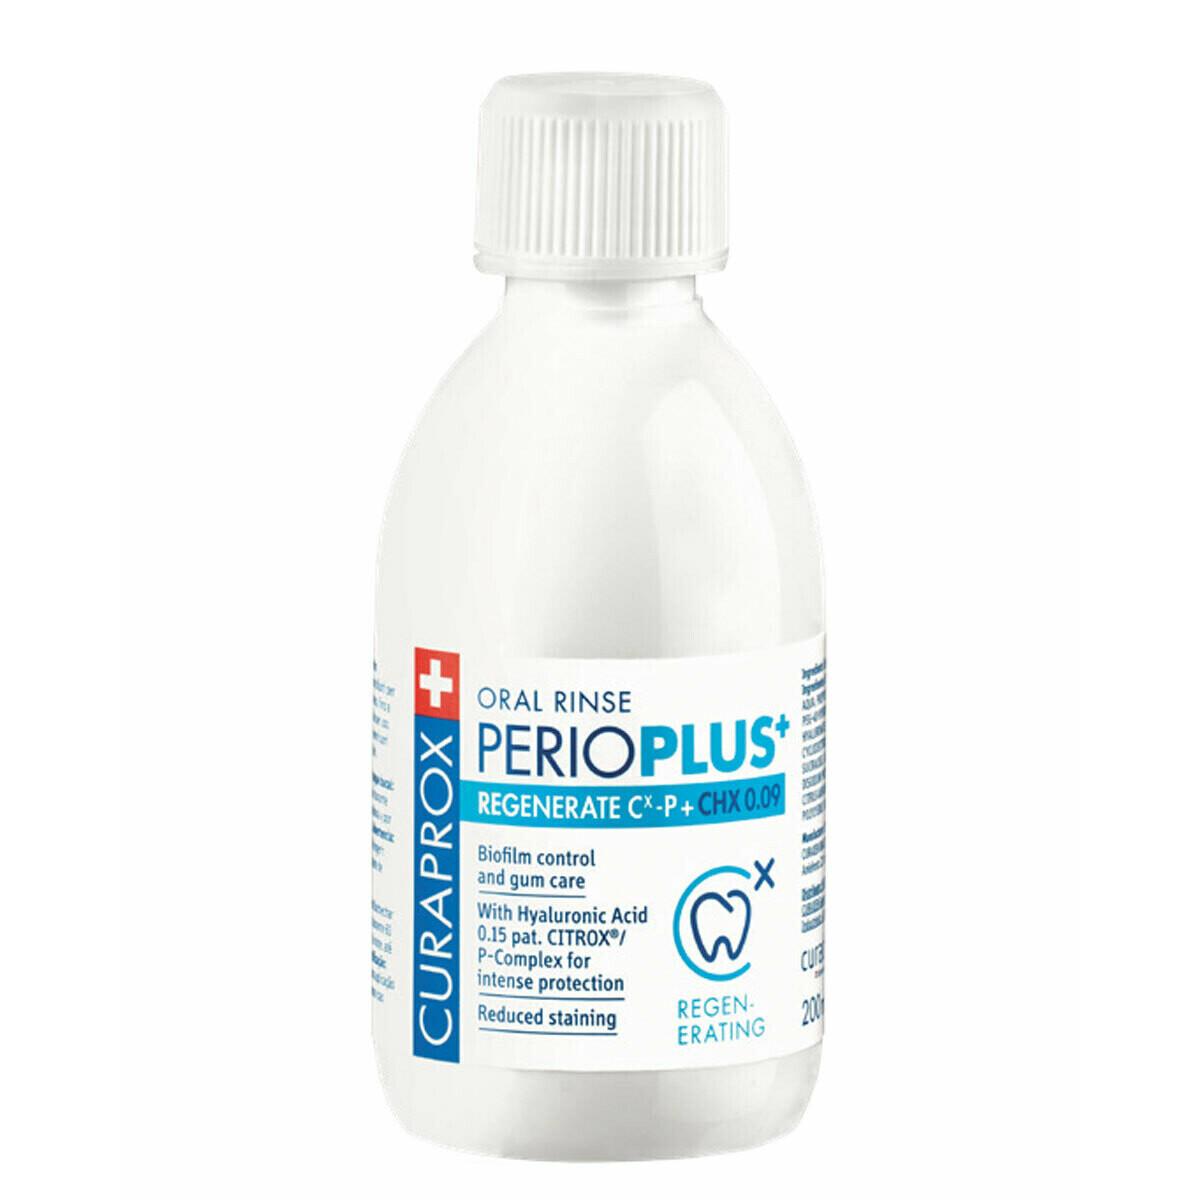 Curaprox ополаскиватель полости рта PerioPlus REGENERATE chx 0.09 %